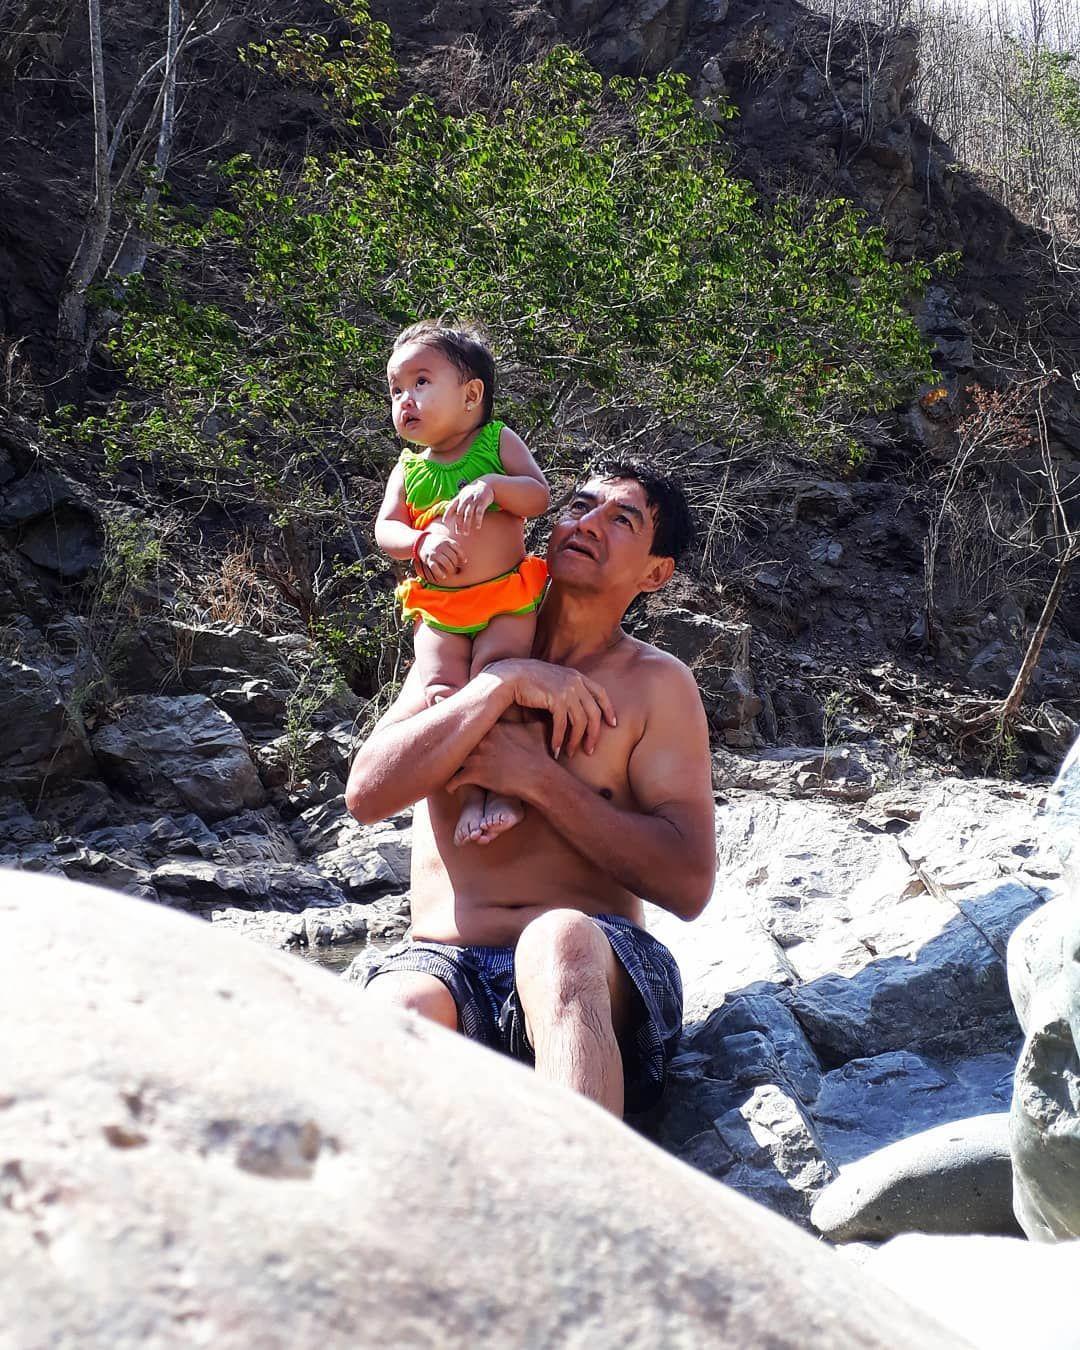 👑Papá❤  #DiosEresPerfecto👑 #inquebrantables #ecuador 😍😍😍😍😍😍😍😍😍😍😍😍😍😍😍😍😍😍 ♡♡♡♡♡♡♡♡♡♡♡♡♡♡♡♡♡♡♡♡♡♡ #dioseresperfecto #siemprejuntos❤ #Photography #Love #Instagood #Photooftheday #Beautiful #Happy #Art #Picoftheday #tbt #cute #Like4like #me #Instalike #Smile #amor #frasesdeamor #frases #frasesbonitas #amores #latinos #earthfocus #EcuadorEnTusOjos #SoutAmerica #AllYouNeedIsEcuador #America